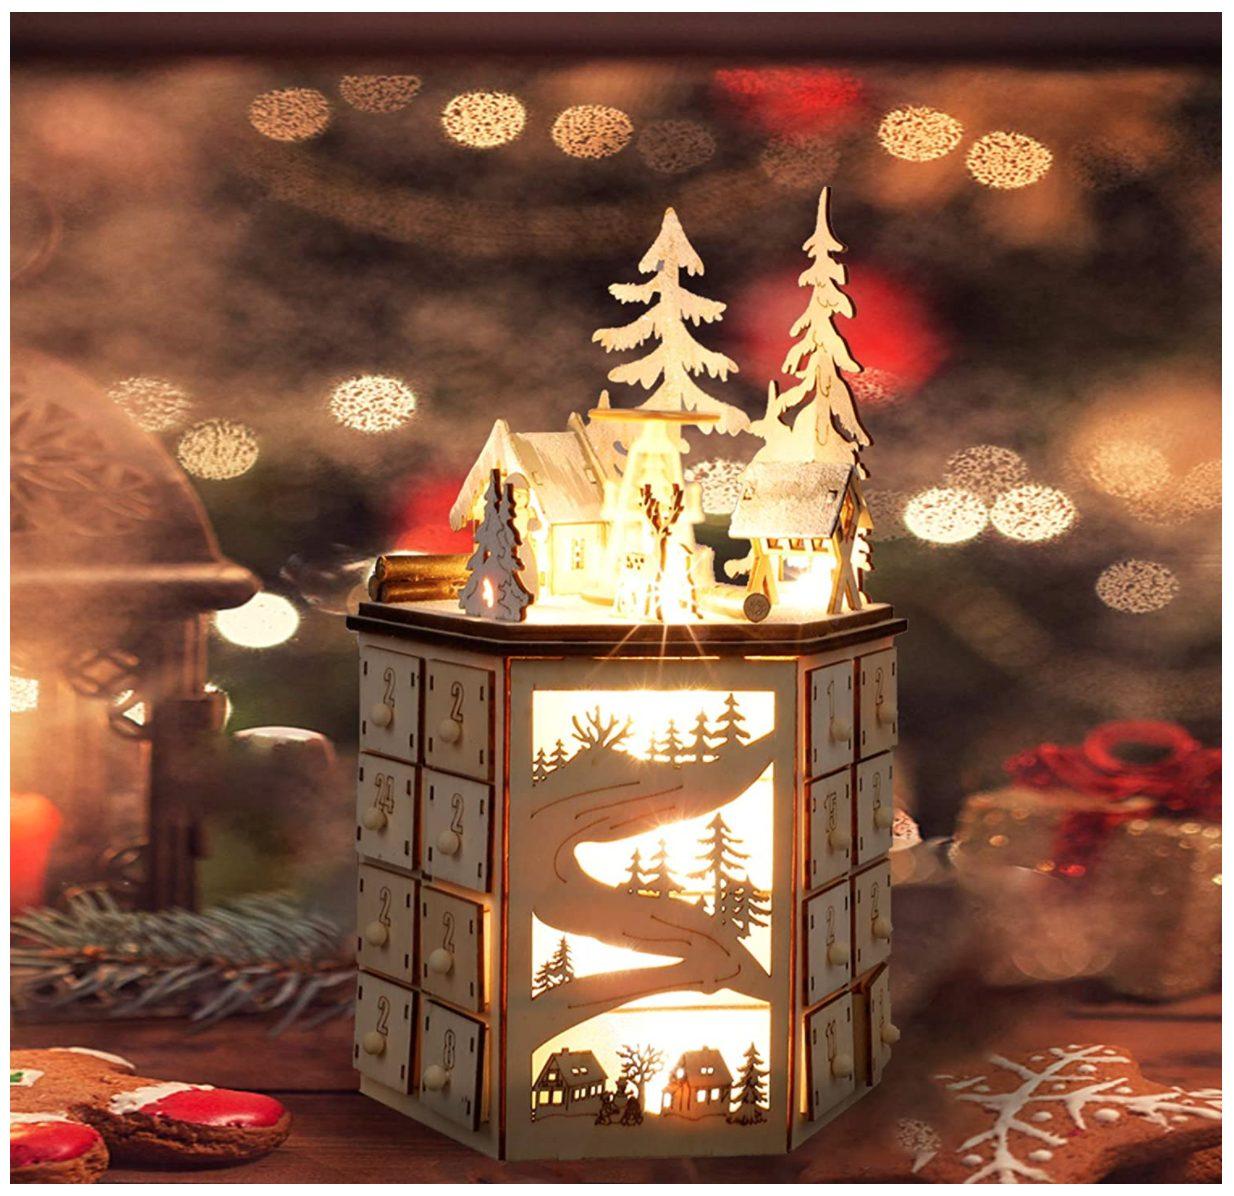 Illuminated Christmas Advent Calendar